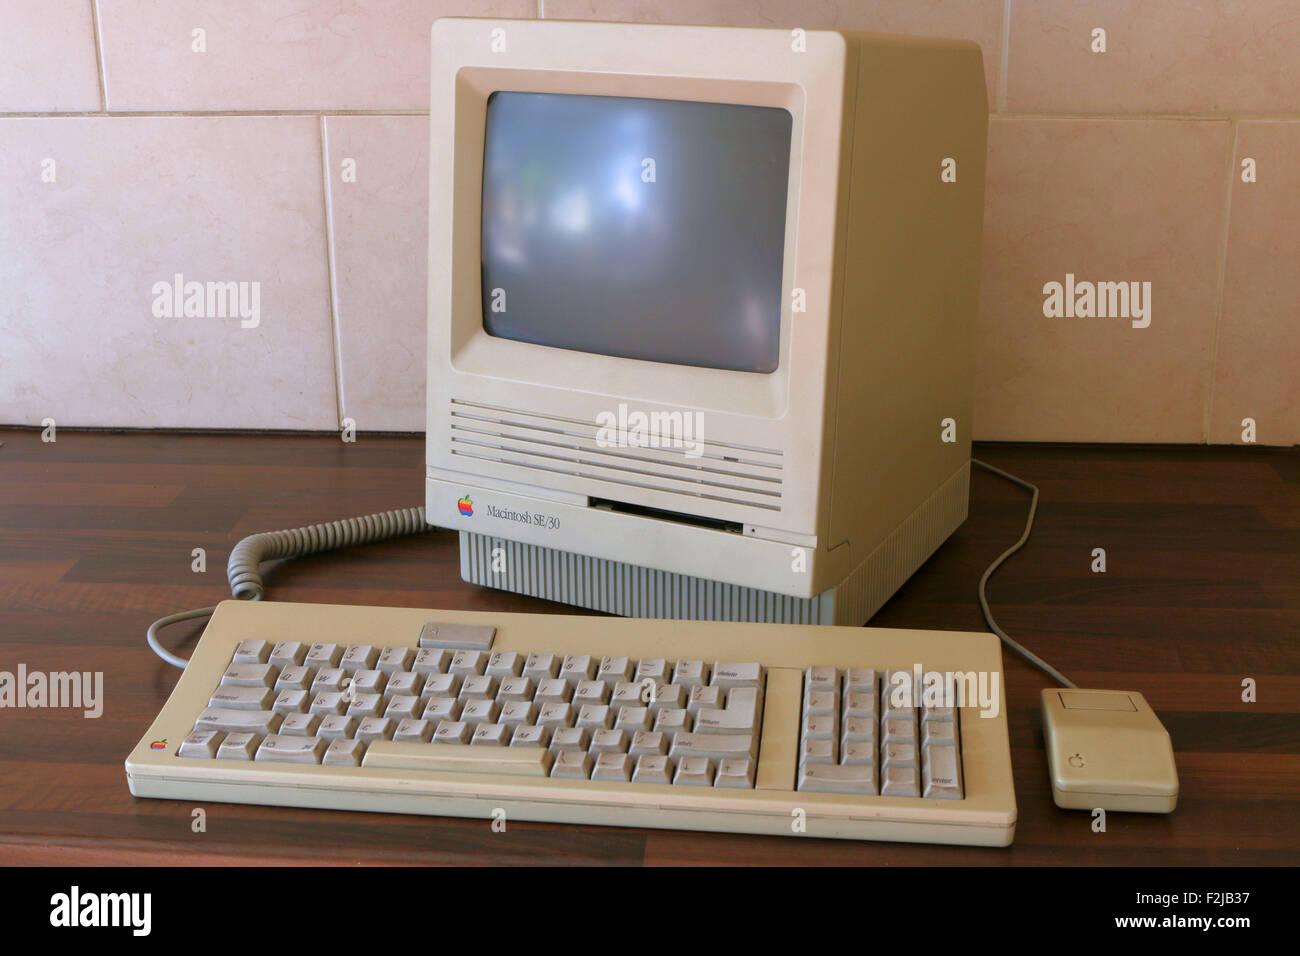 1989 Apple Macintosh SE/30 computer - Stock Image